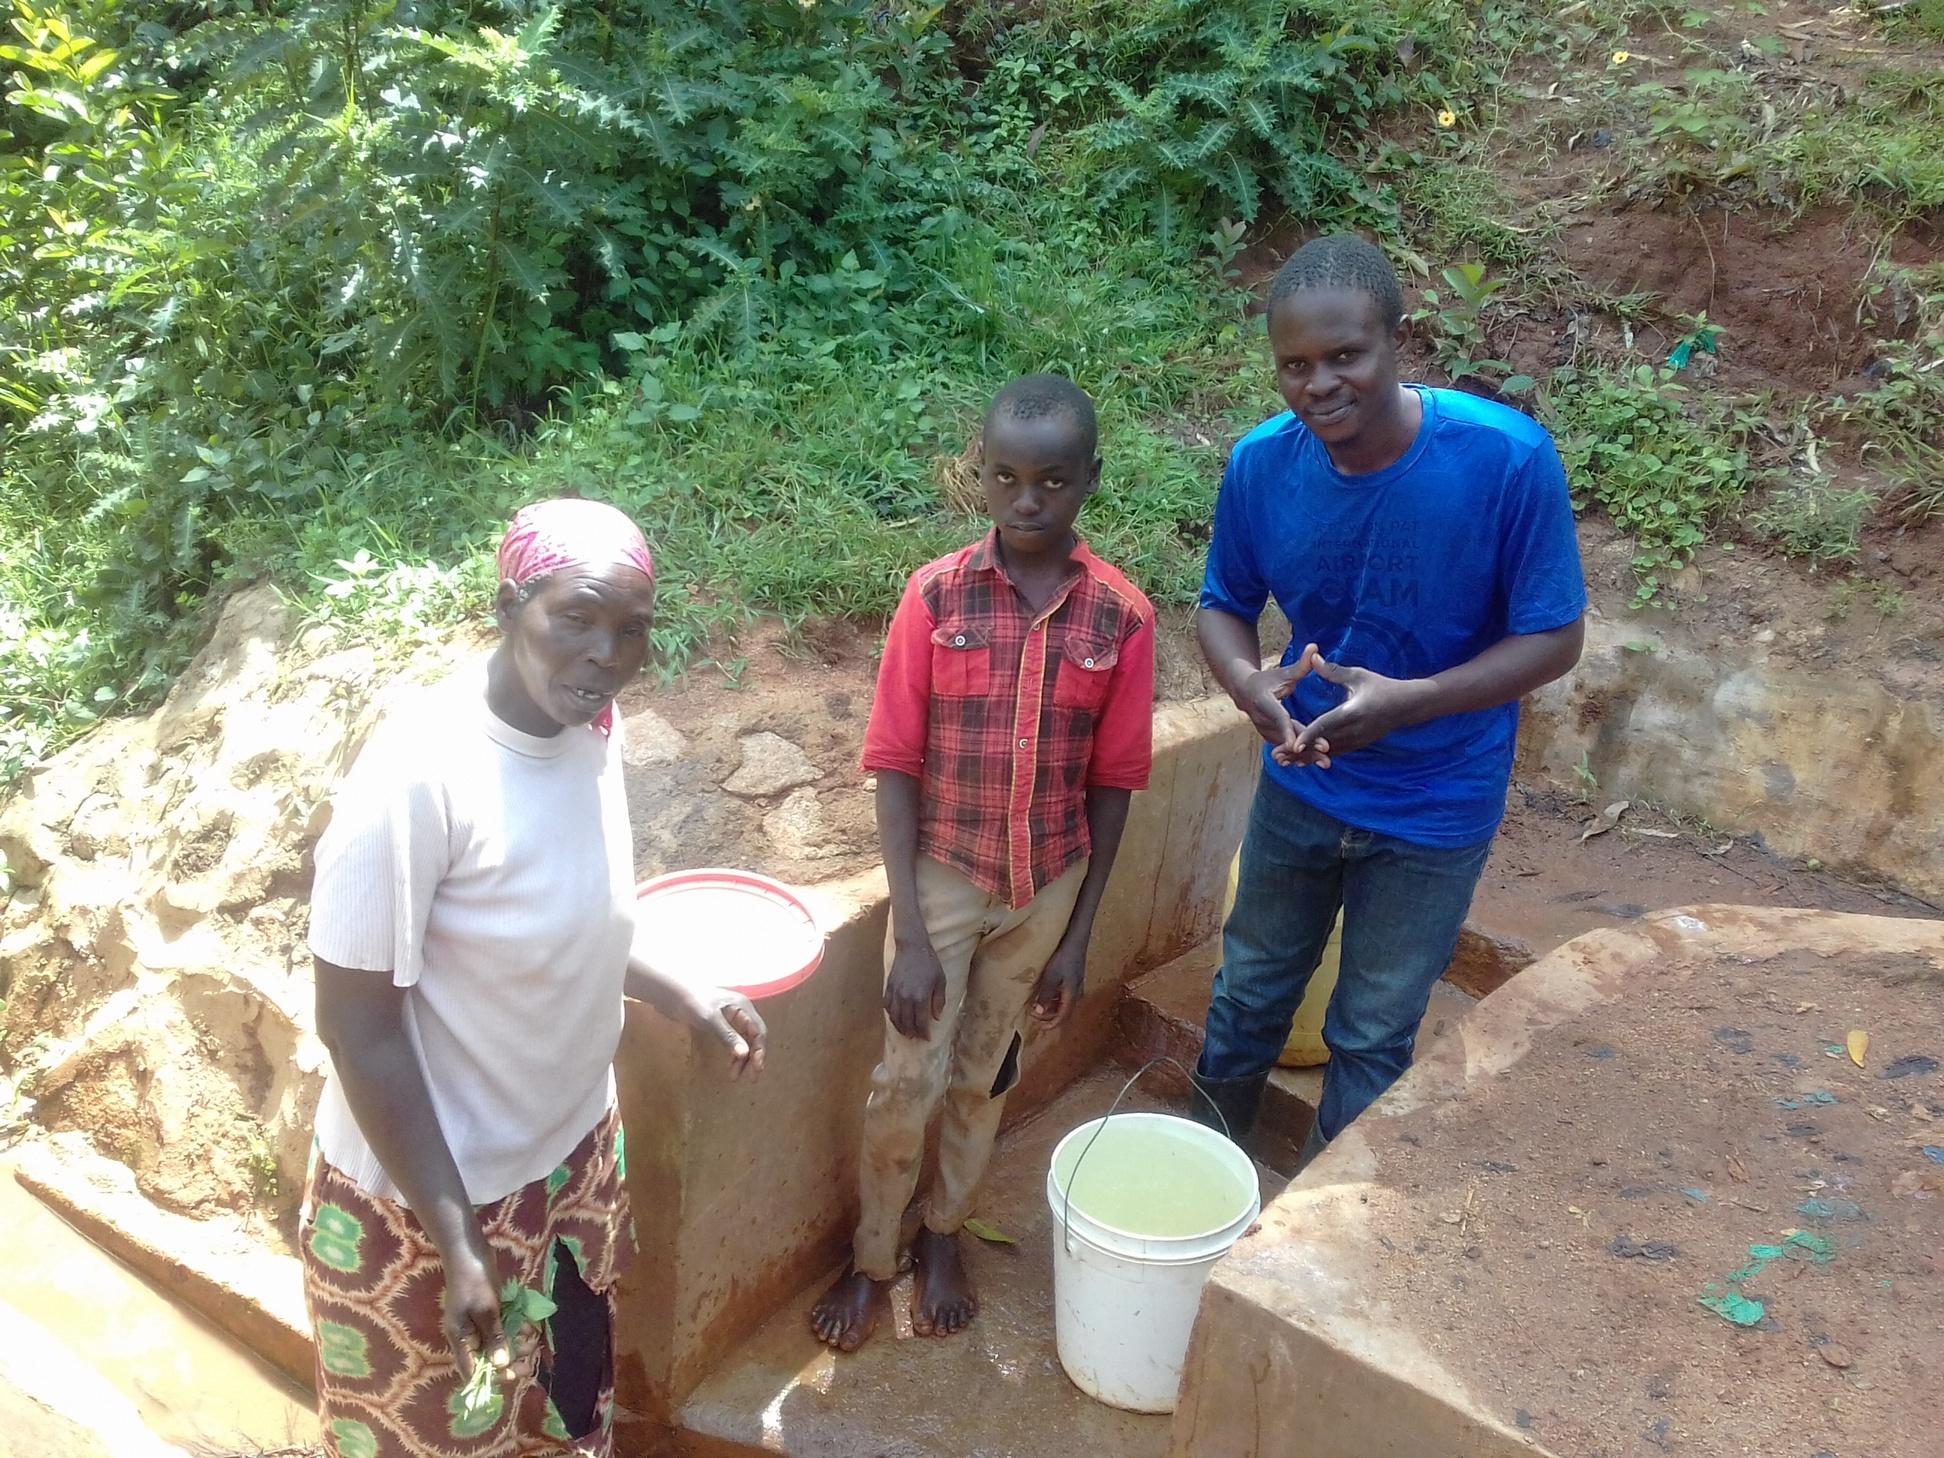 The Water Project : kenya4852-margaret-lihanda-derick-maraha-and-field-officer-samuel-simidi